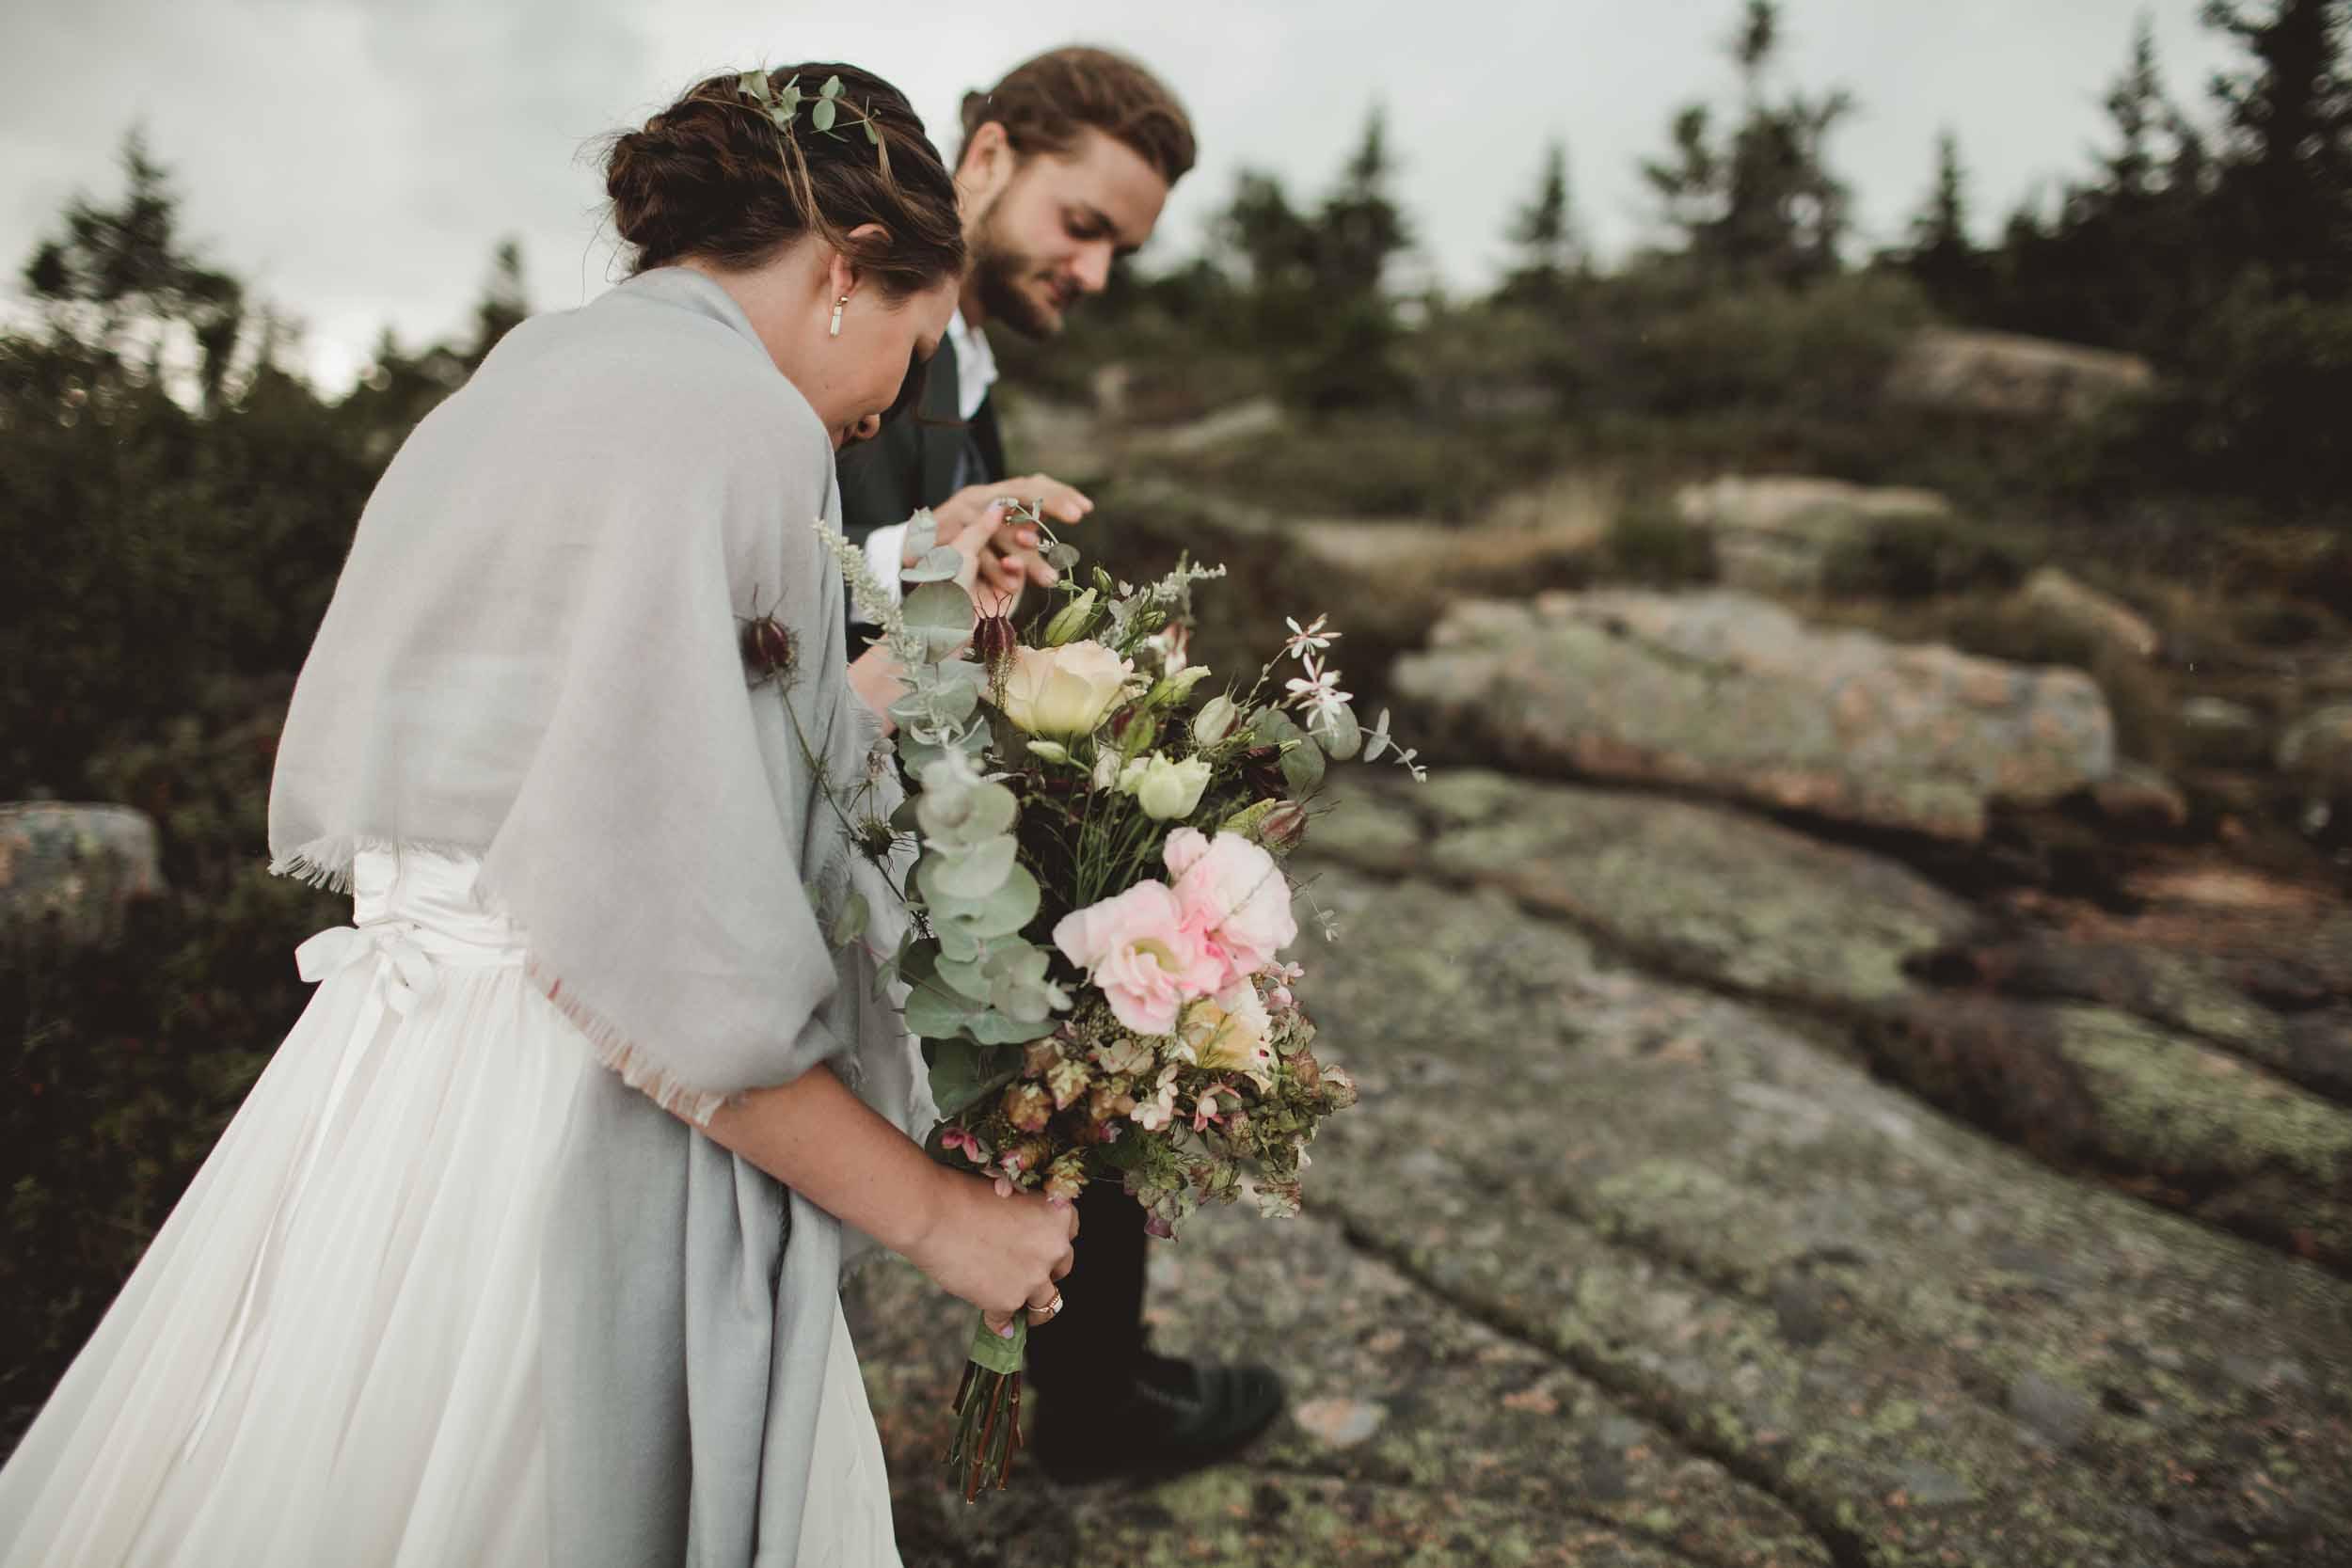 Maine-Elopement-Photographer5.jpg